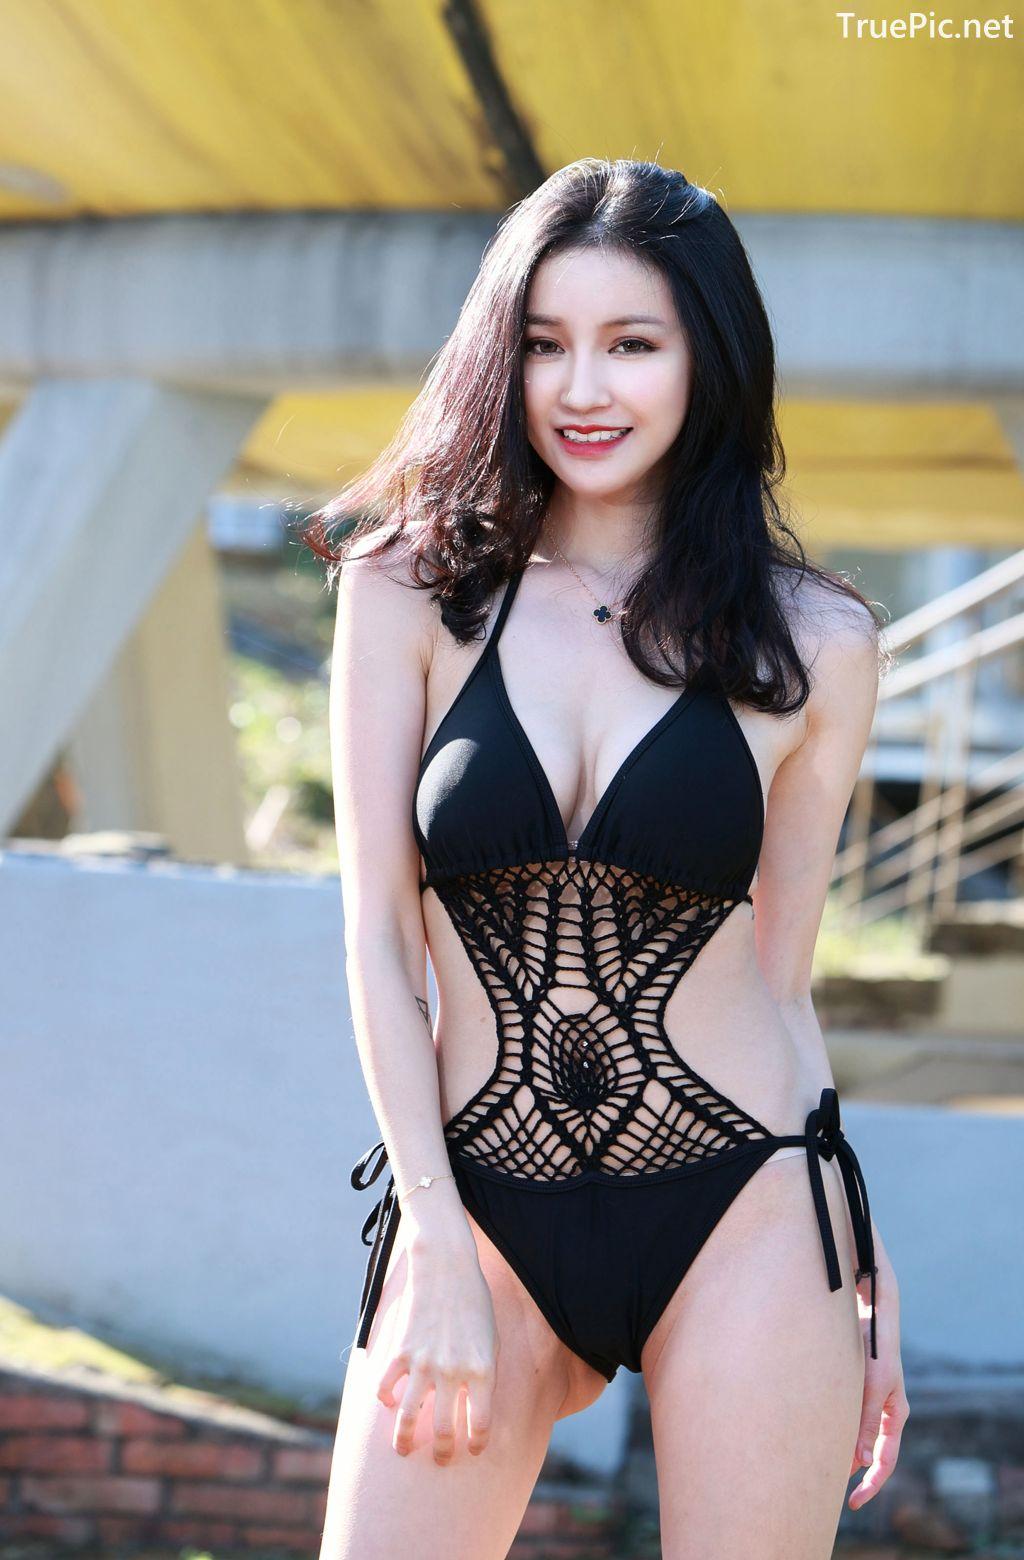 Image-Taiwanese-Model-艾薉-Long-Legs-And-Lovely-Bikini-Girl-TruePic.net- Picture-9